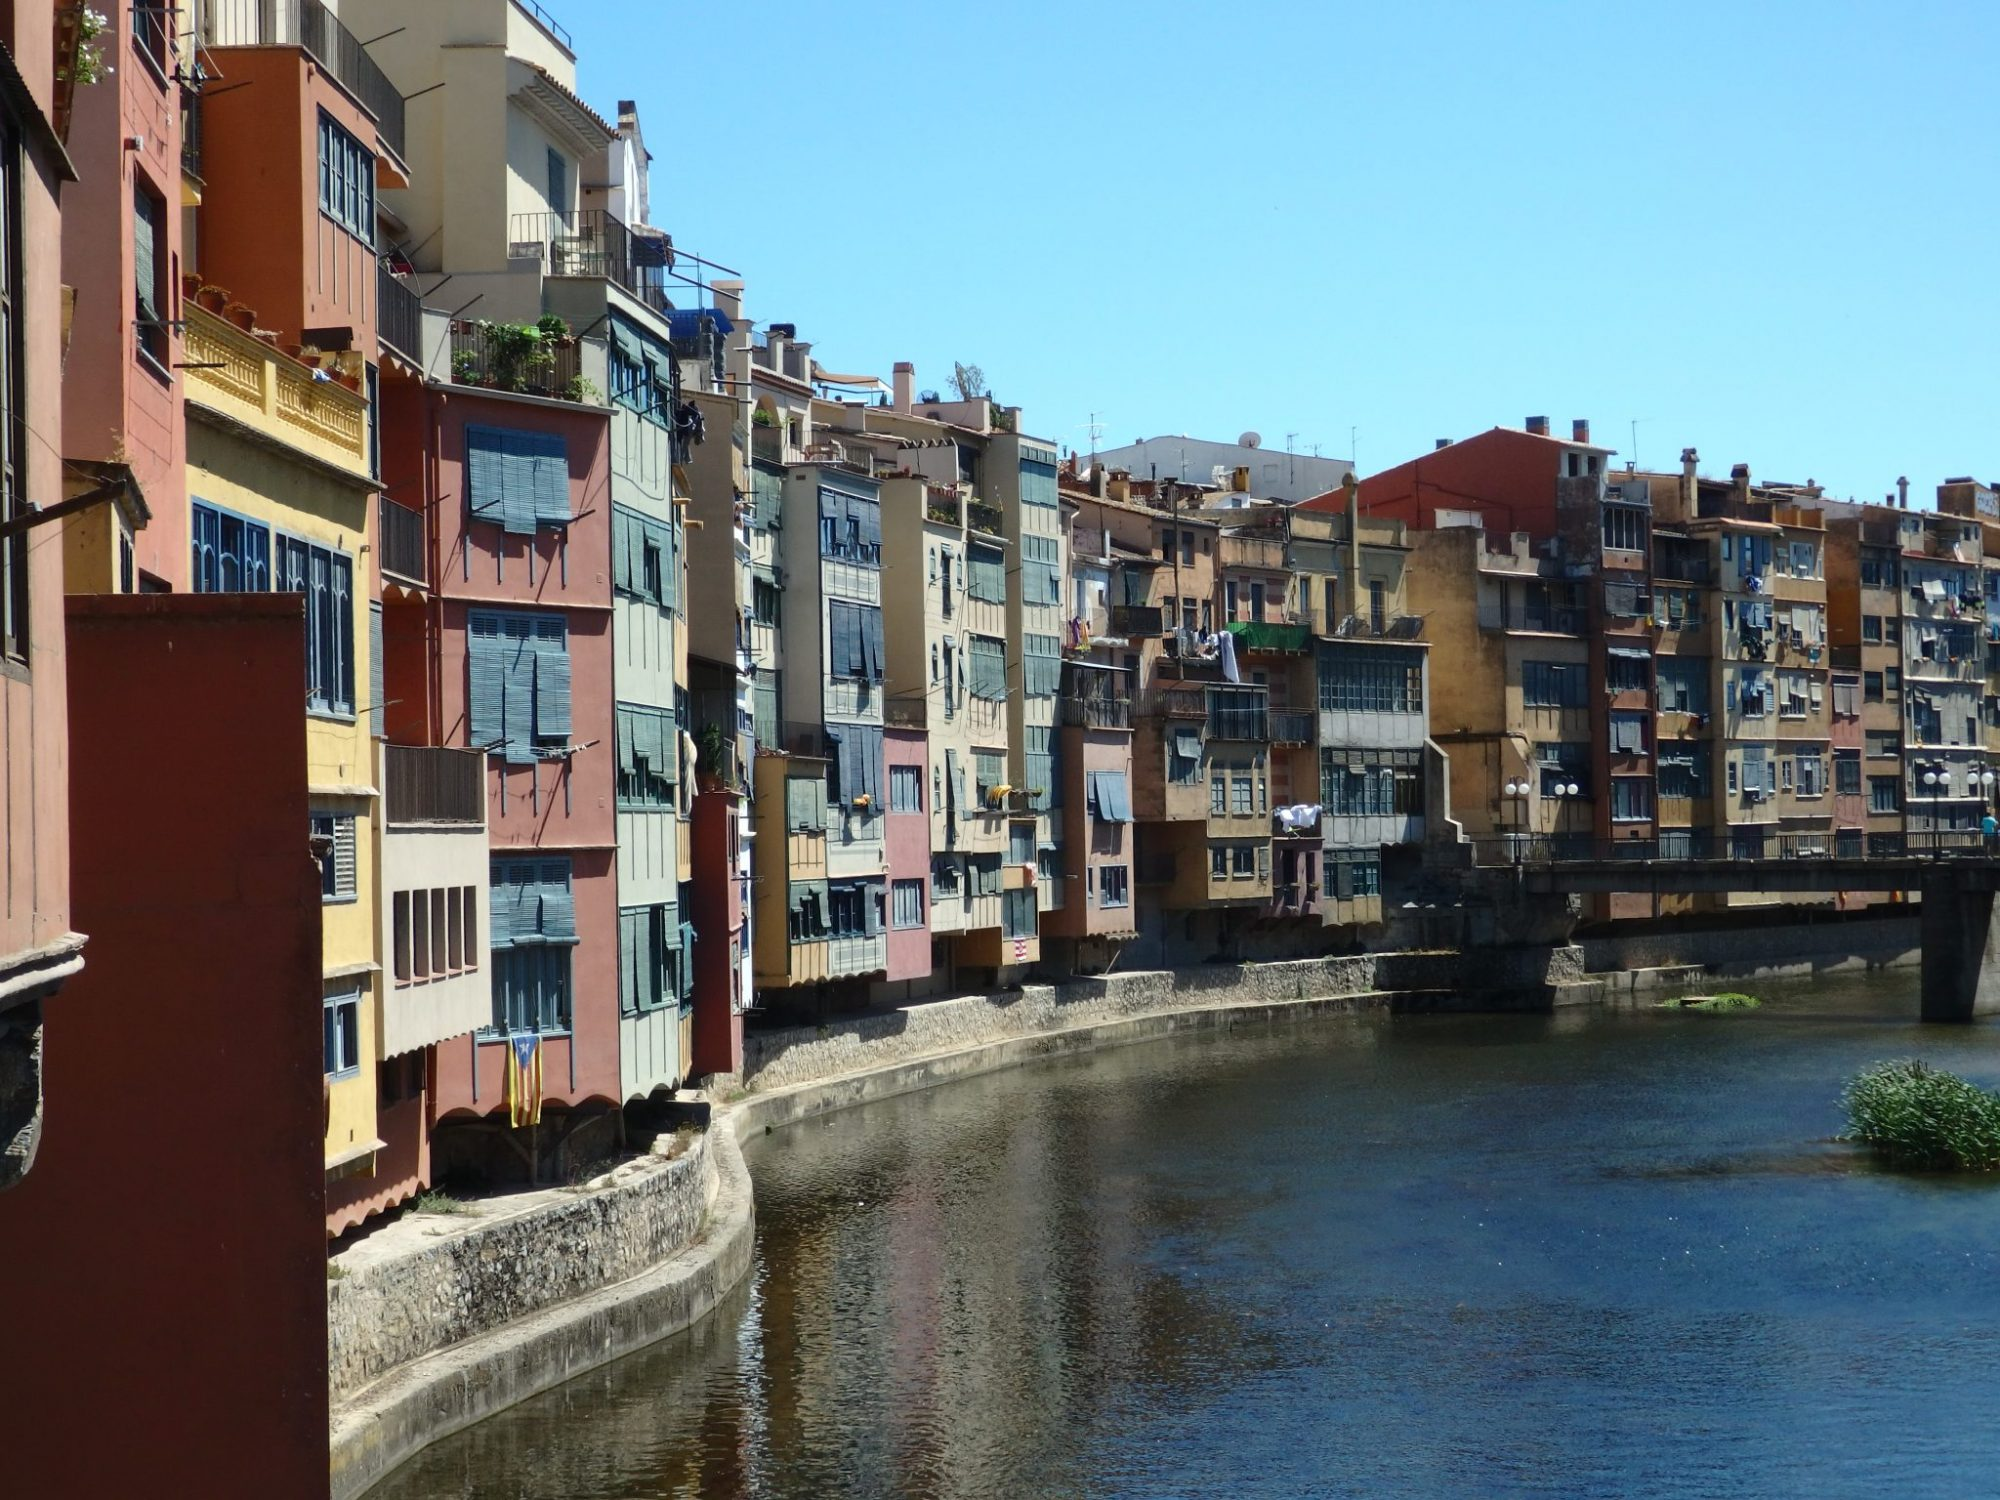 along the river in Girona, Spain